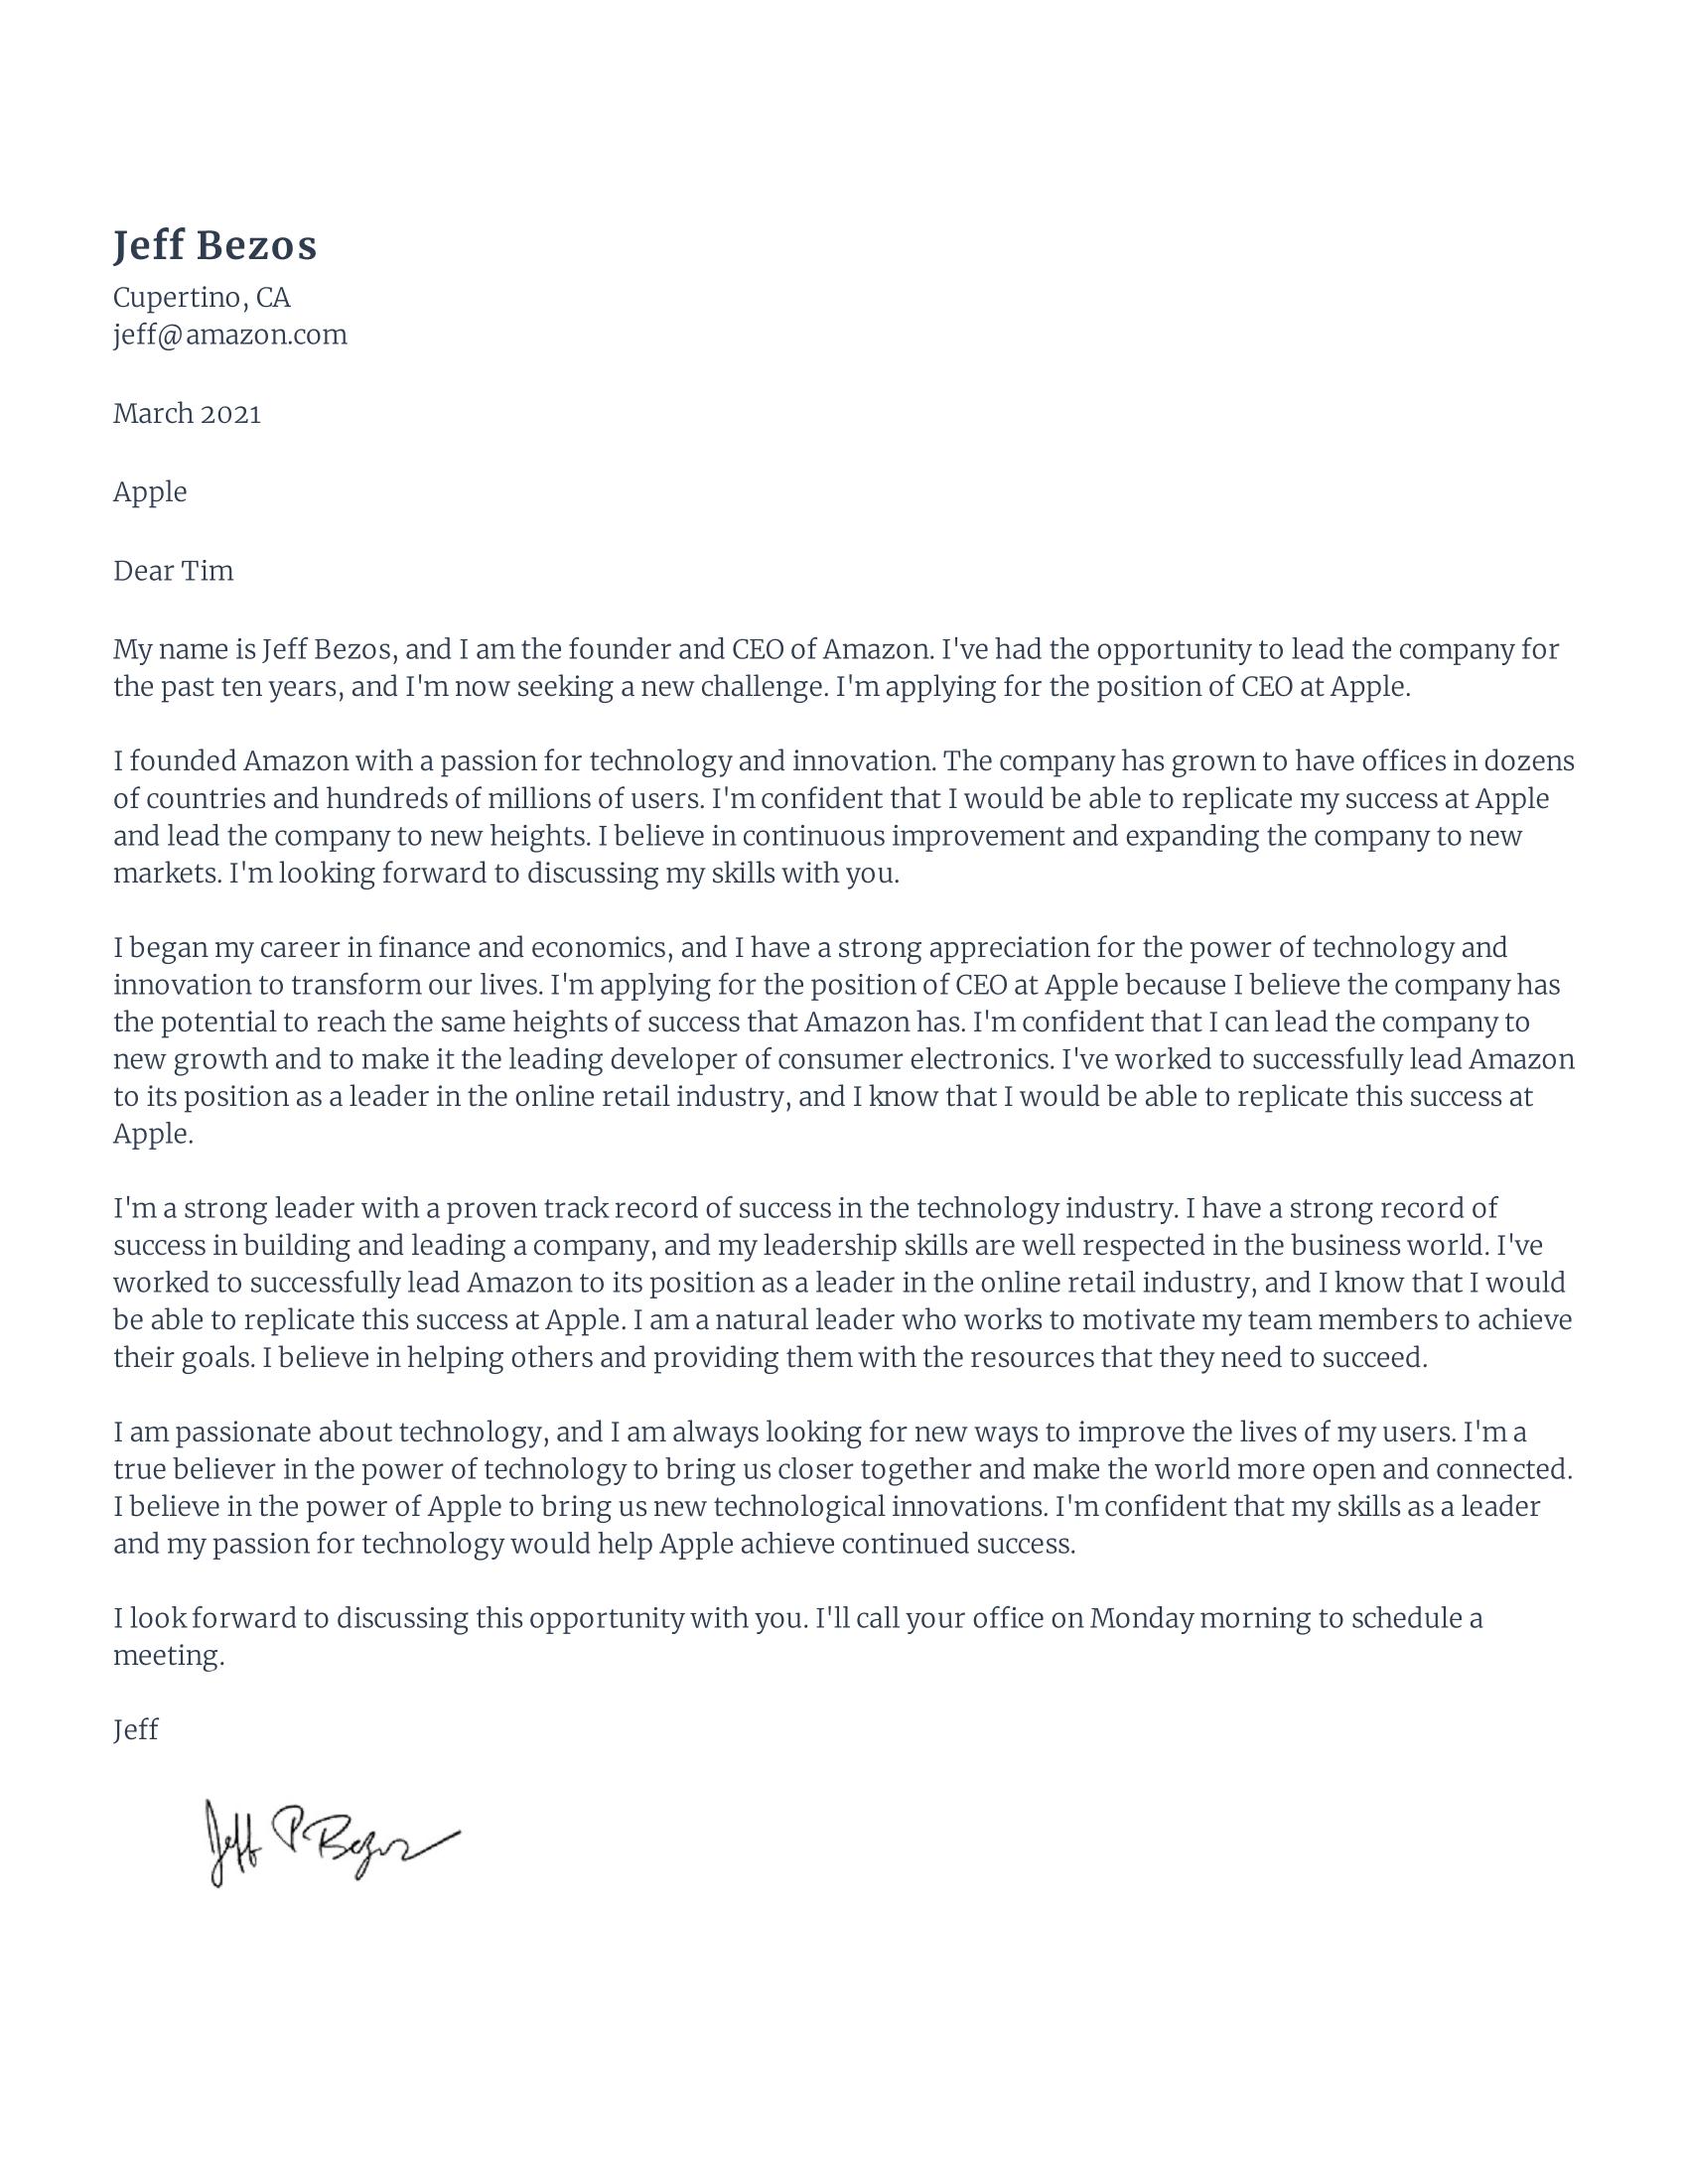 Jeff Bezos cover letter